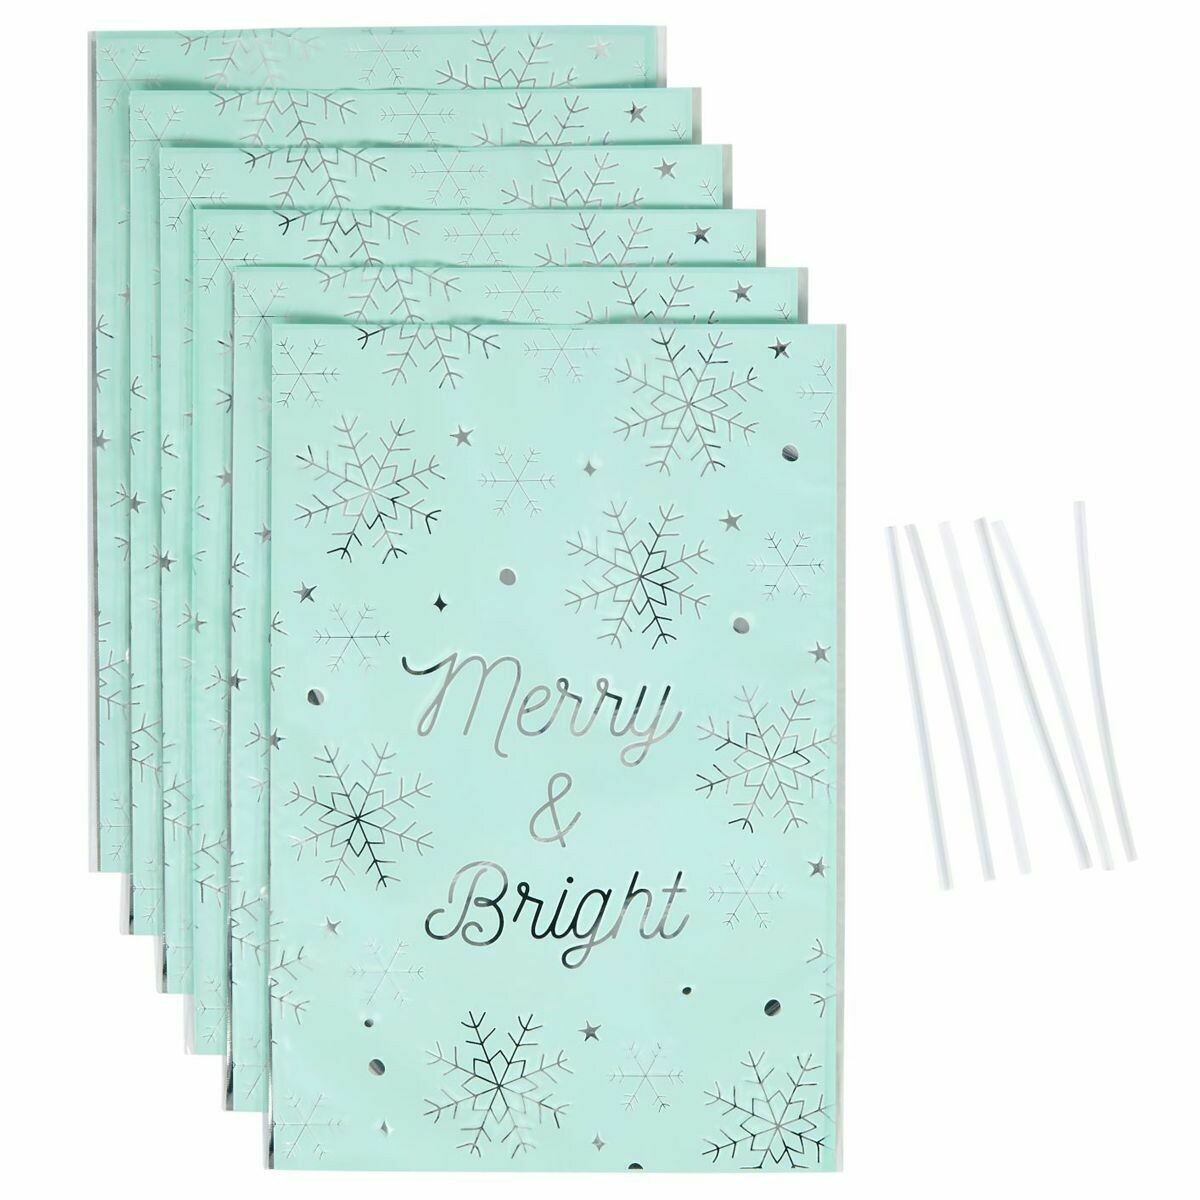 Wilton Christmas Treat Bags -MERRY & BRIGHT -Pack of 6 - 6τεμ Χριστουγεννιάτικα Σακουλάκια για γλυκά με συρματάκια